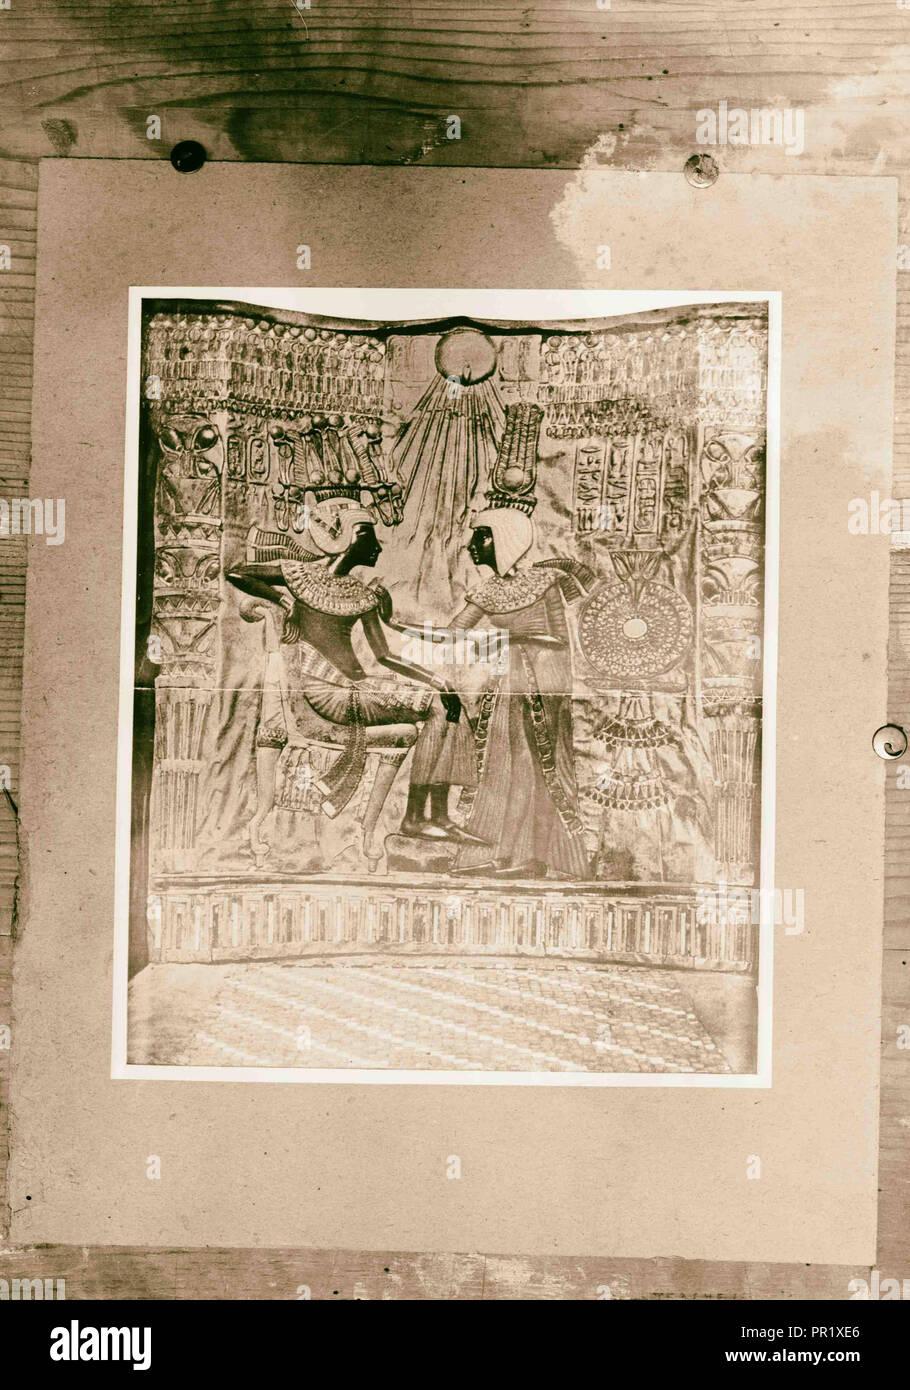 Items from Tutenchamun's [i.e., Tutankhamen's] tomb. Copies. 1922, Egypt - Stock Image